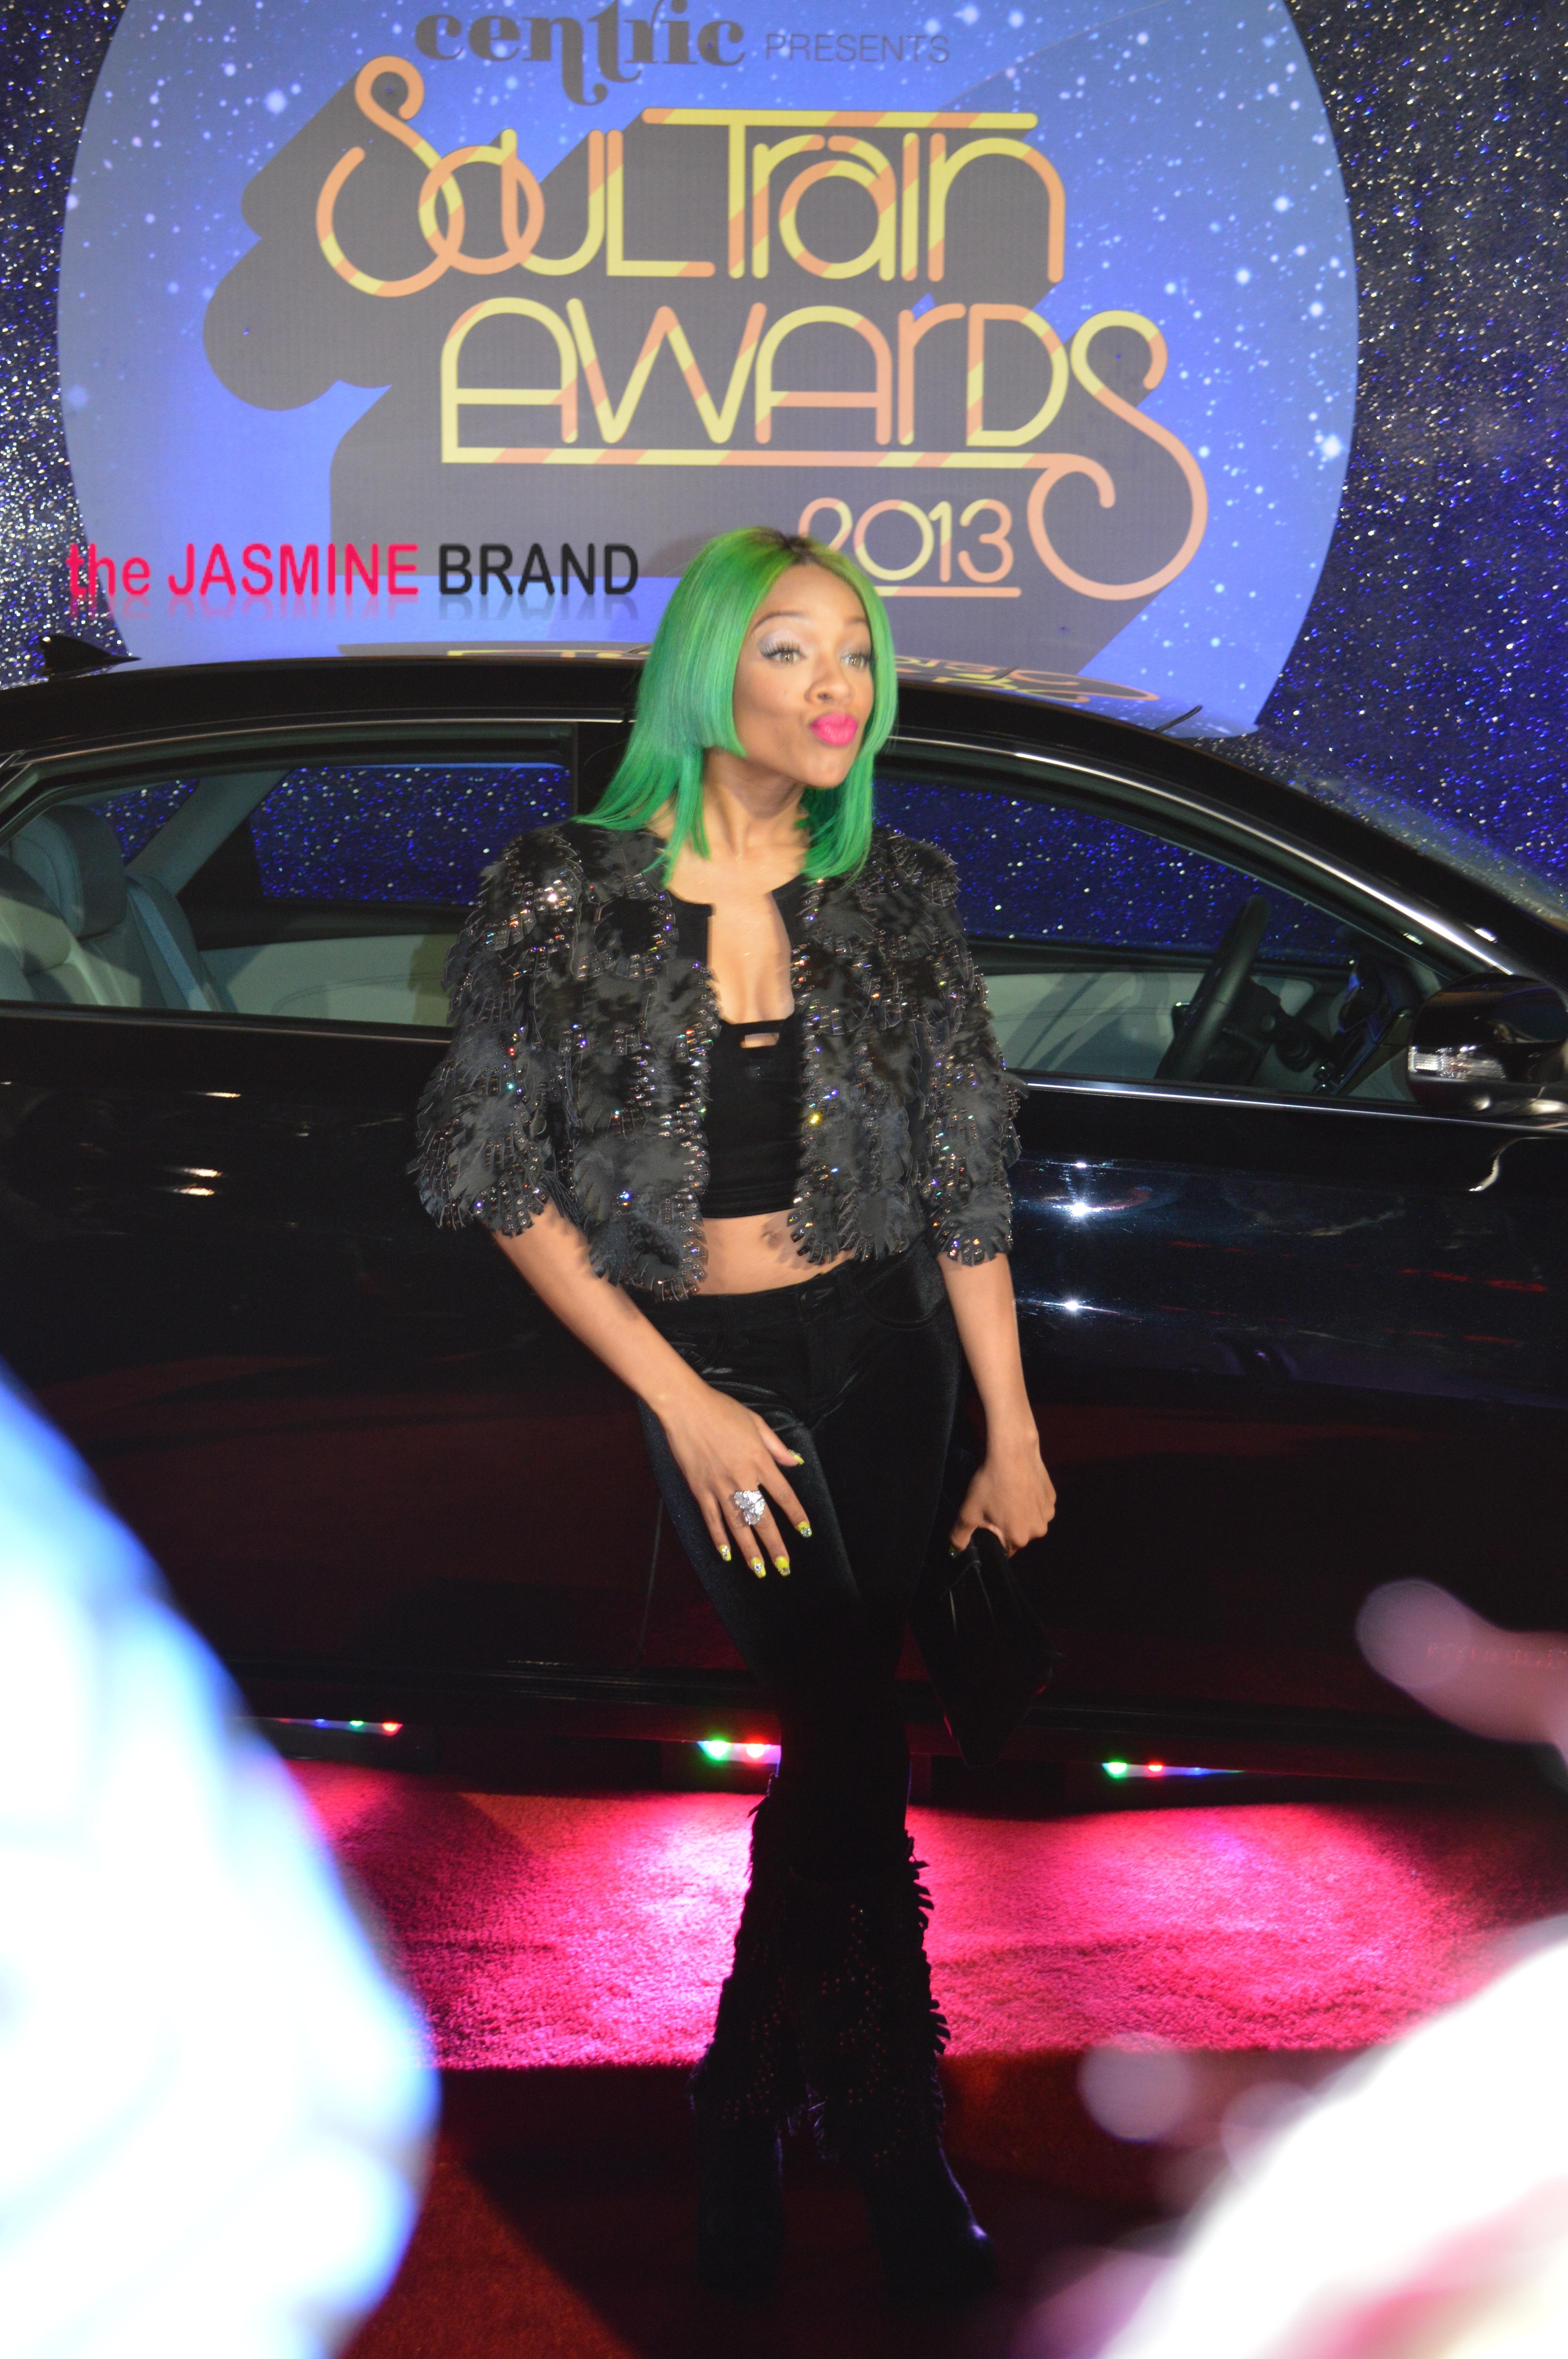 lil mama-soul train awards 2013-the jasmine brand